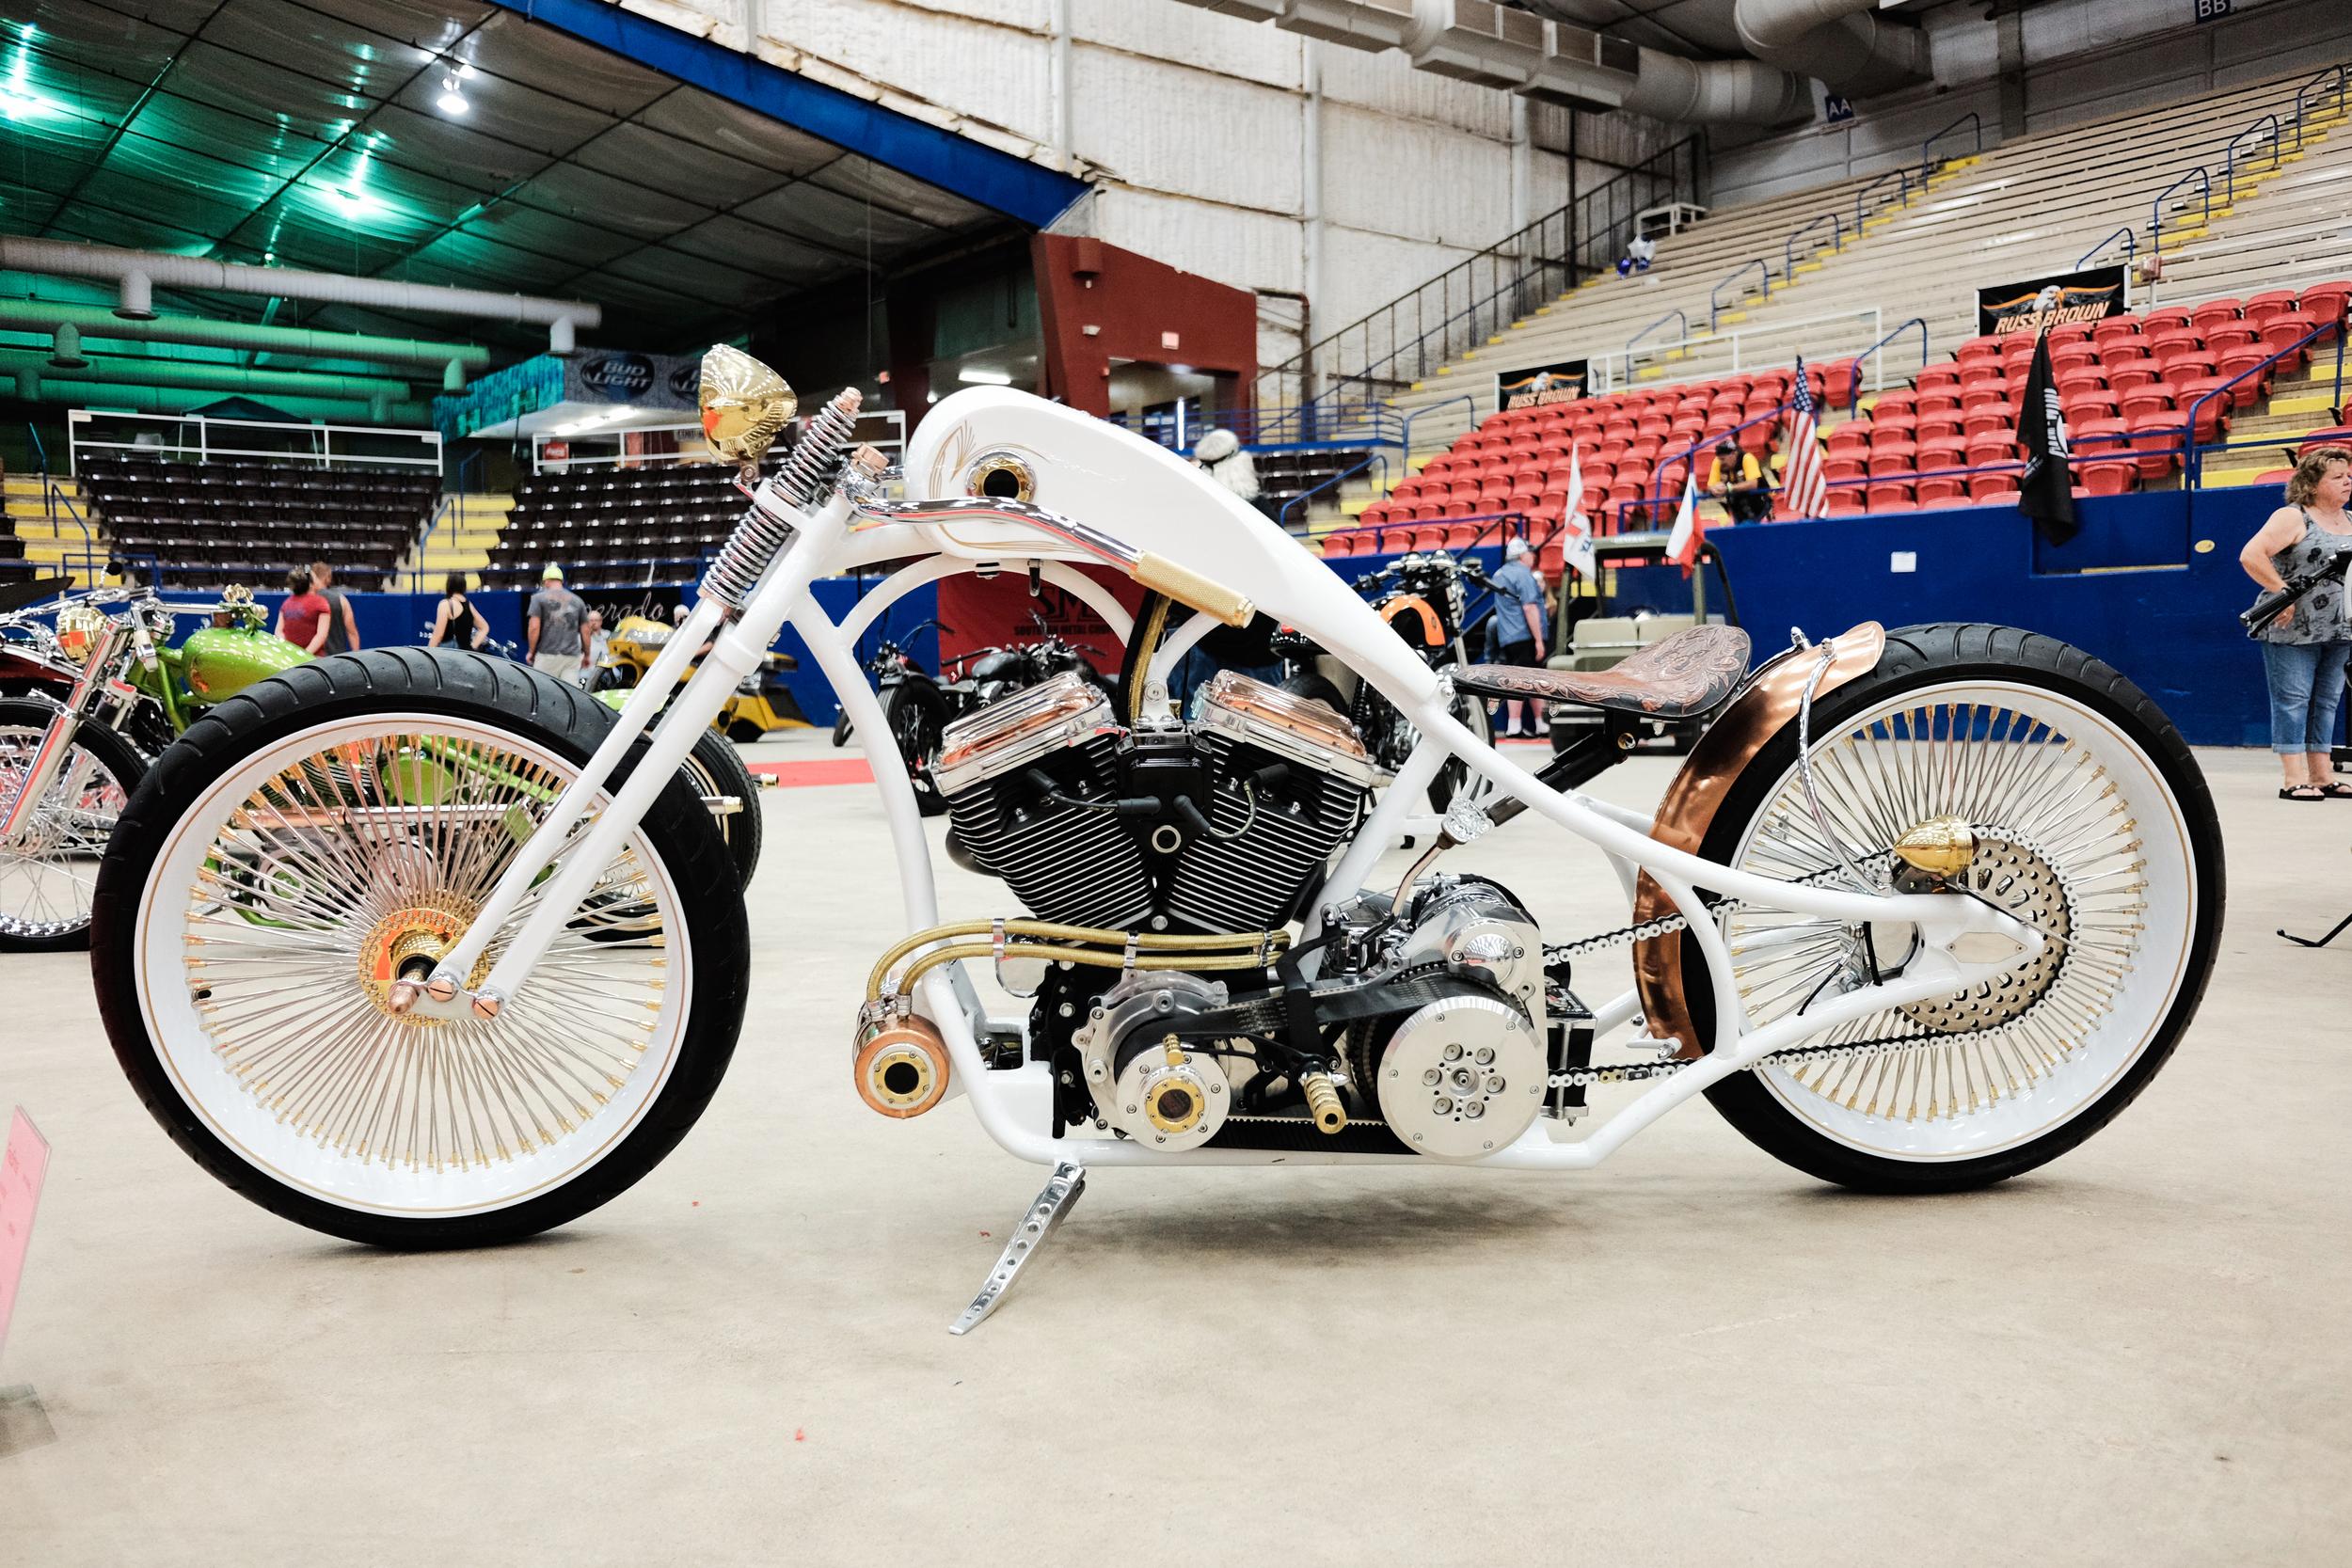 rot-rally-custom-bike-show-2016-0059.jpg